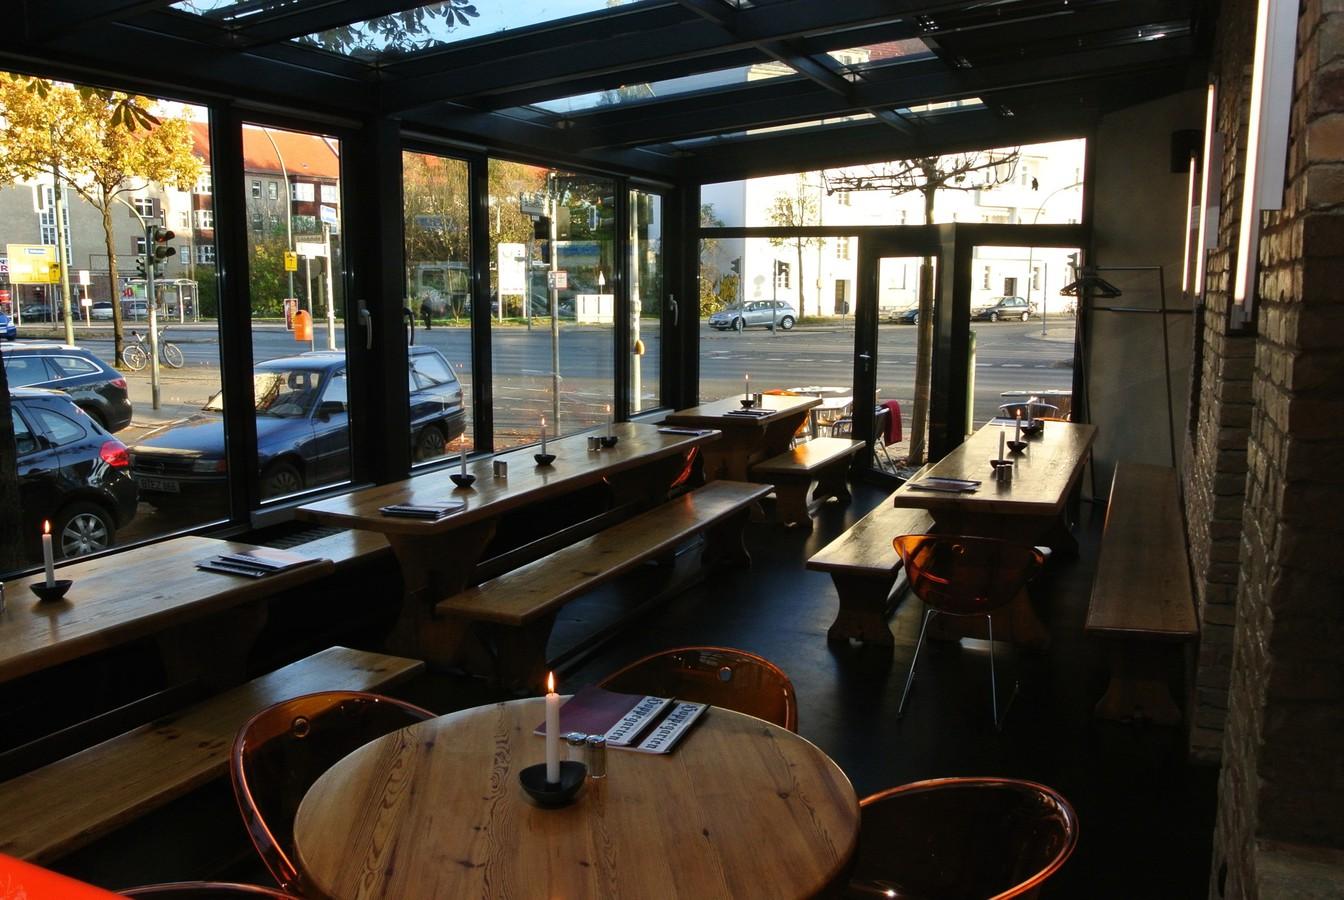 Emejing Circus Hervorragendes Restaurant Interieur Ideas - Farbideen ...